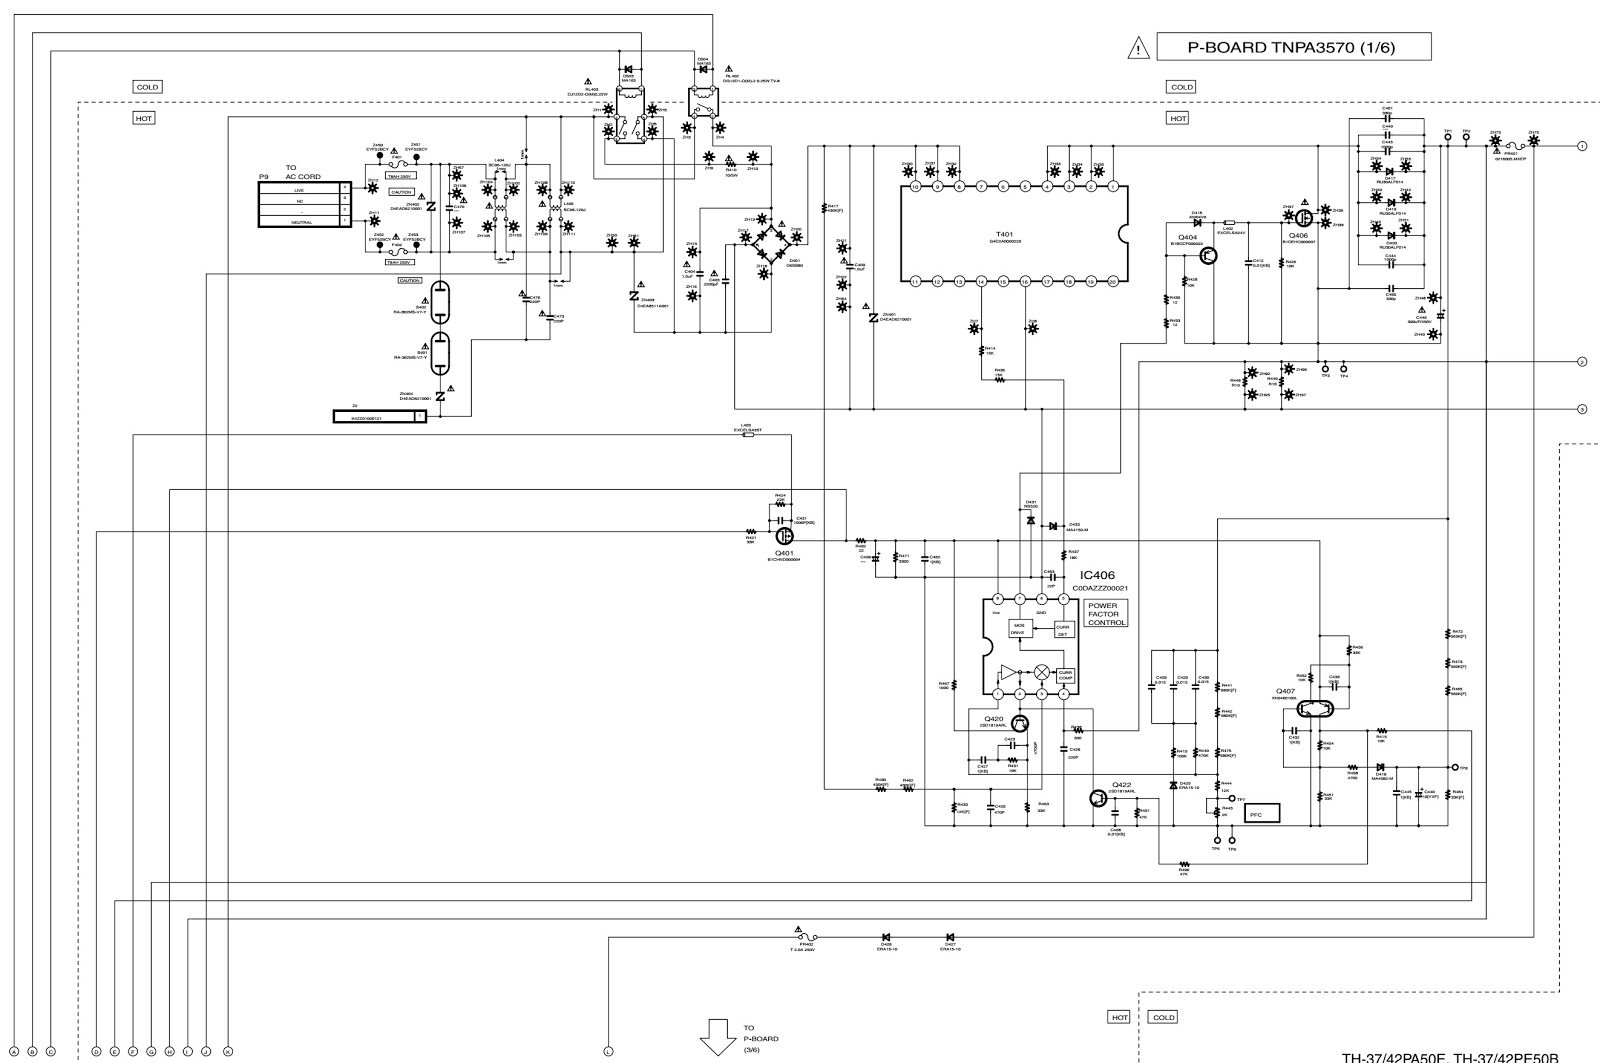 small resolution of panasonic plasma tv th42 th37 power board schematic panasonic tv parts direct panasonic tv parts direct